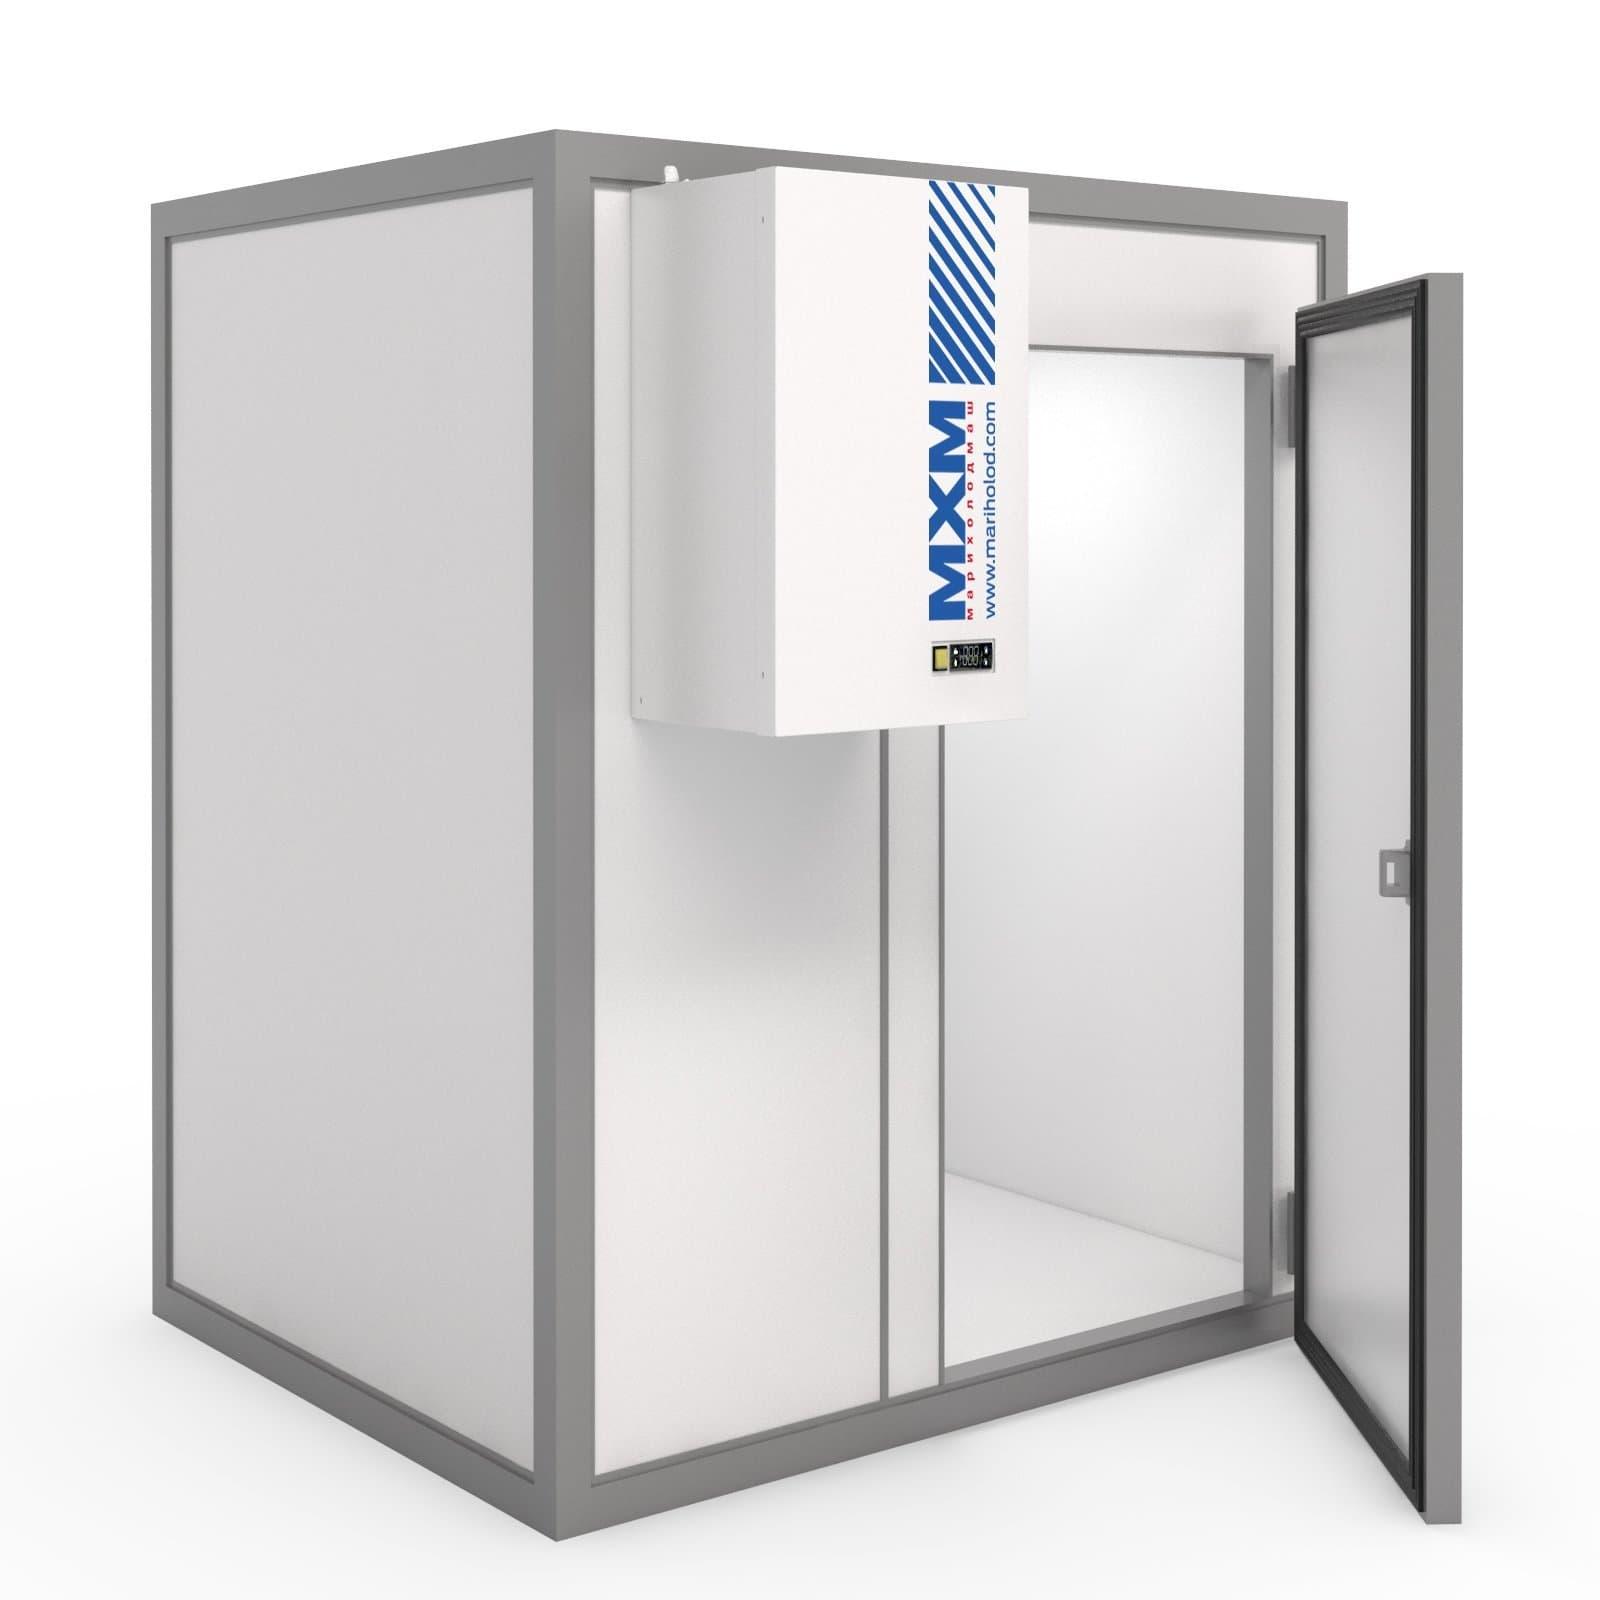 Камера холодильная КХН-121,65 (2560×19960×2720 мм)